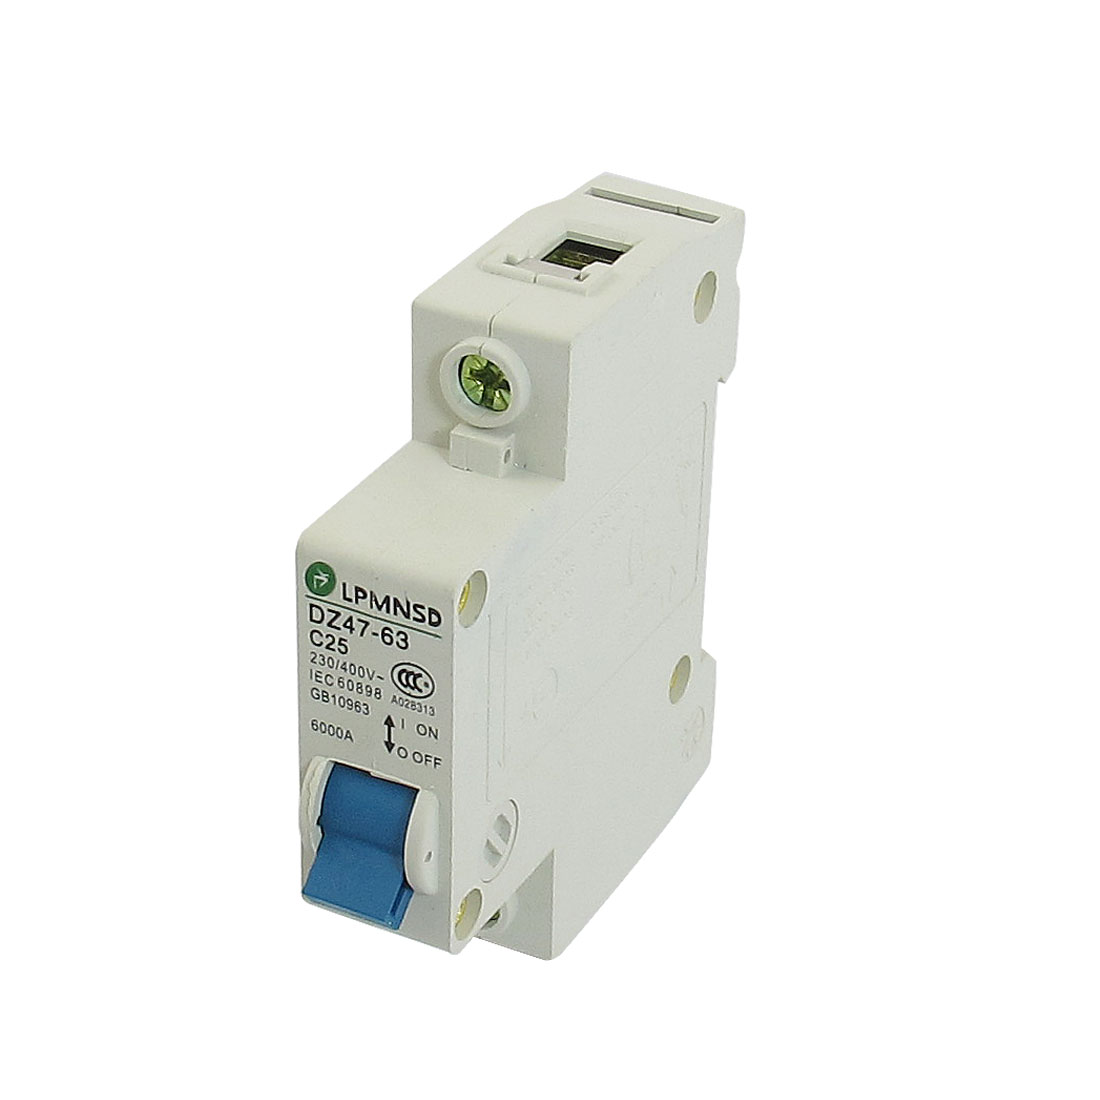 DZ47-63 C25 25A 230/400VAC 6000A Breaking Capacity 1 Poles Circuit Breaker